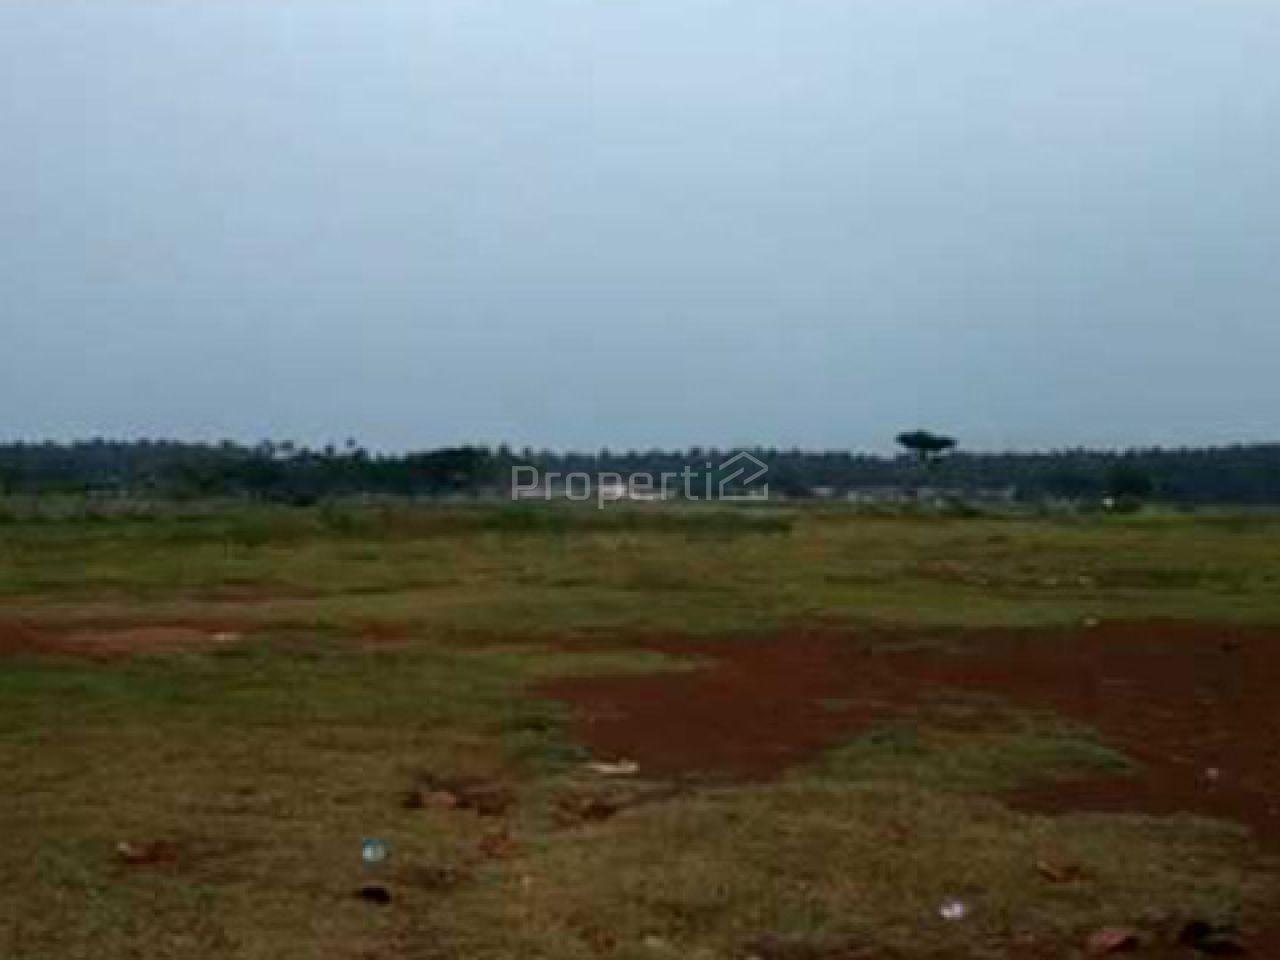 Tanah Darat dan Datar di Mauk, Tangerang, Banten